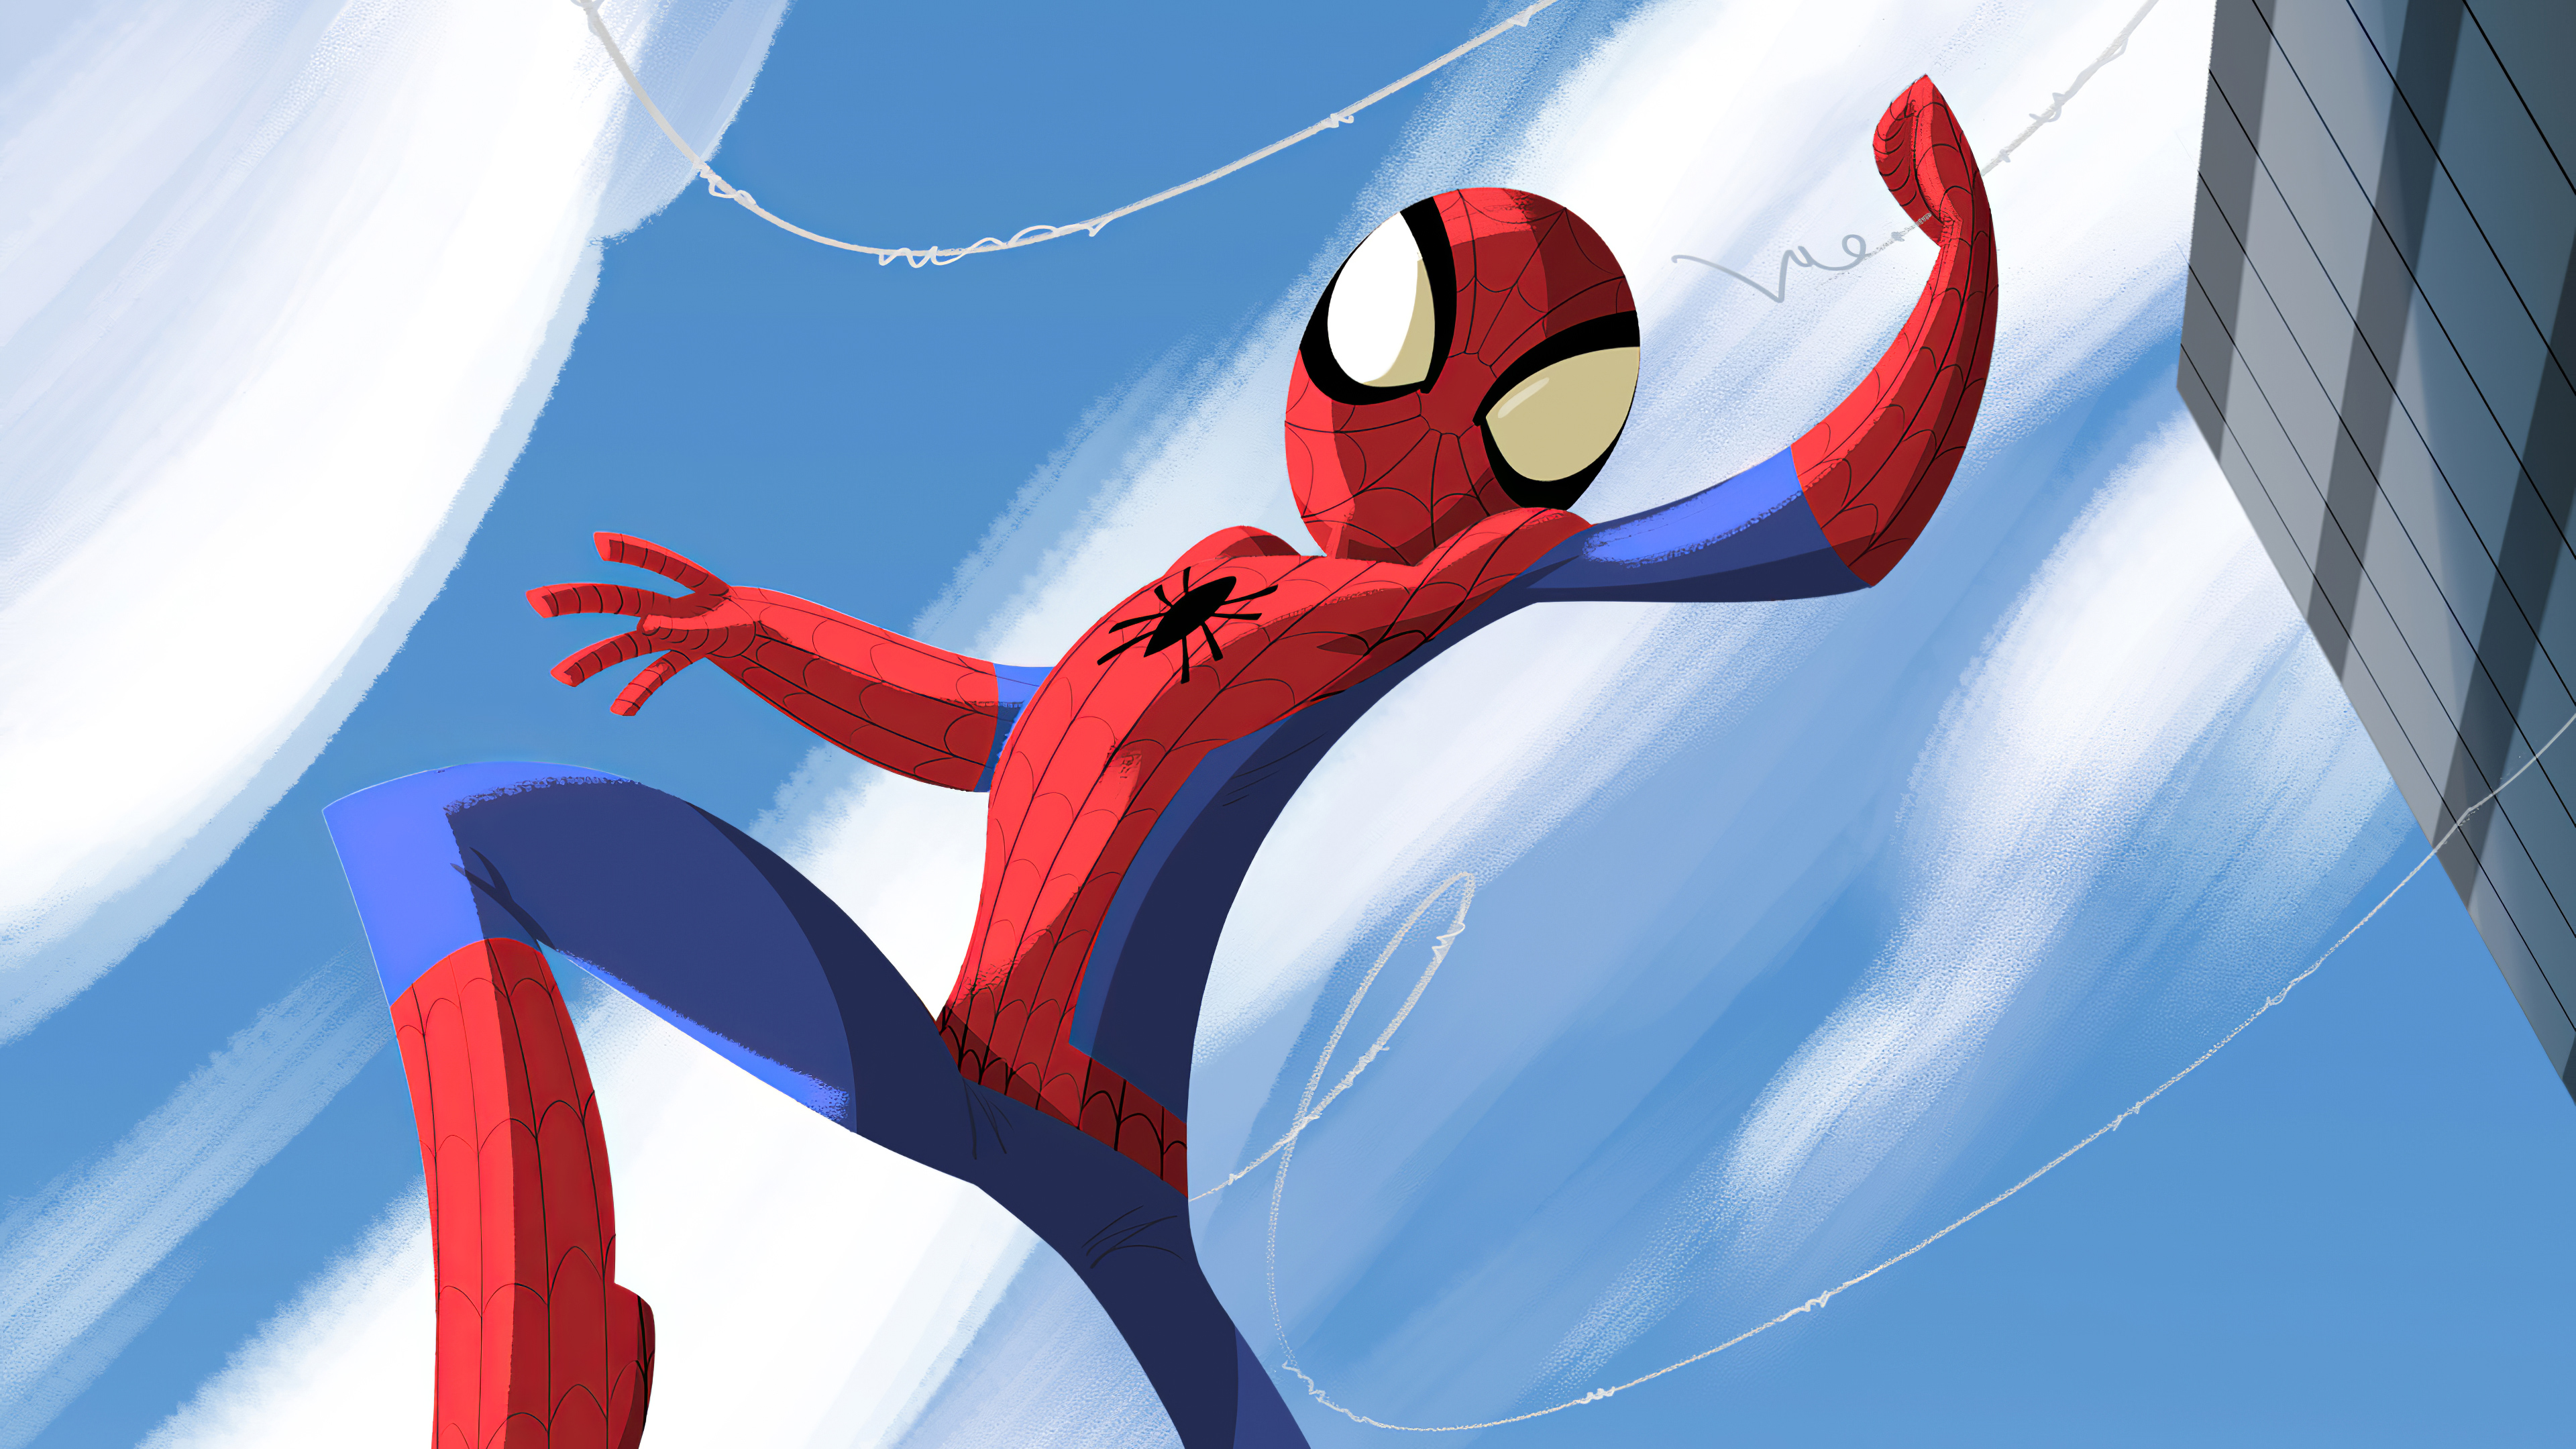 spiderman jumping through 1574274751 - Spiderman Jumping Through -